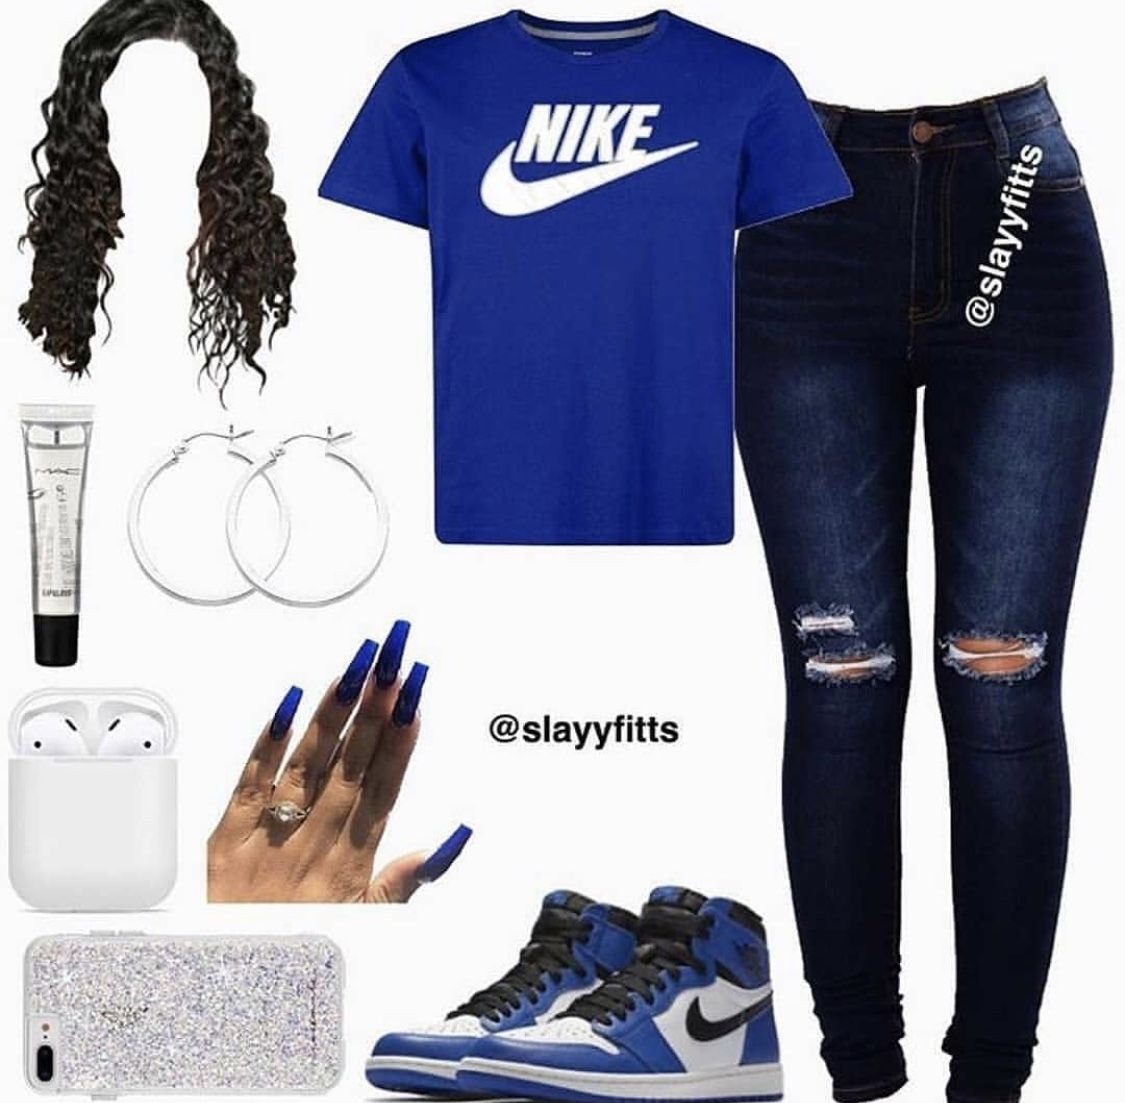 Pin by Petty🤍 on \u2022 Outfit Inspo \u203c️✨